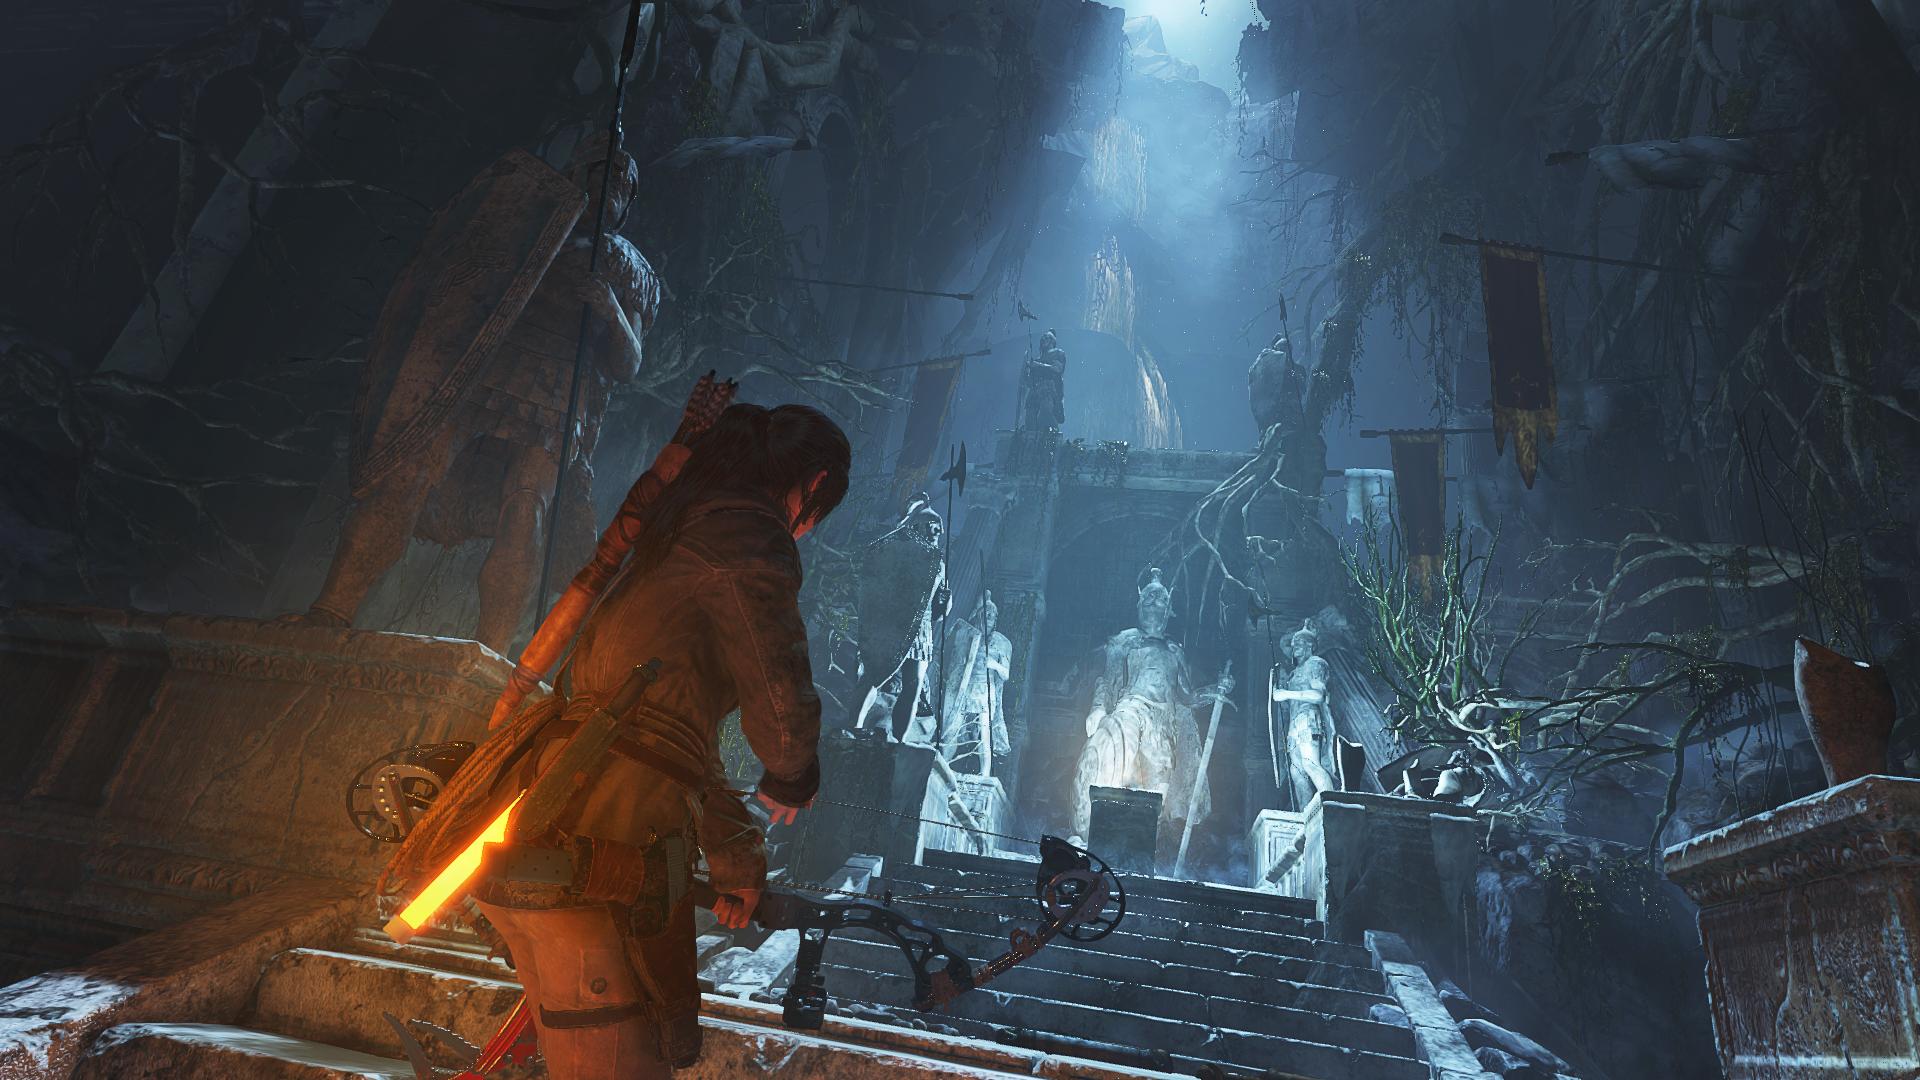 Lara Croft in Rise of the Tomb Raider